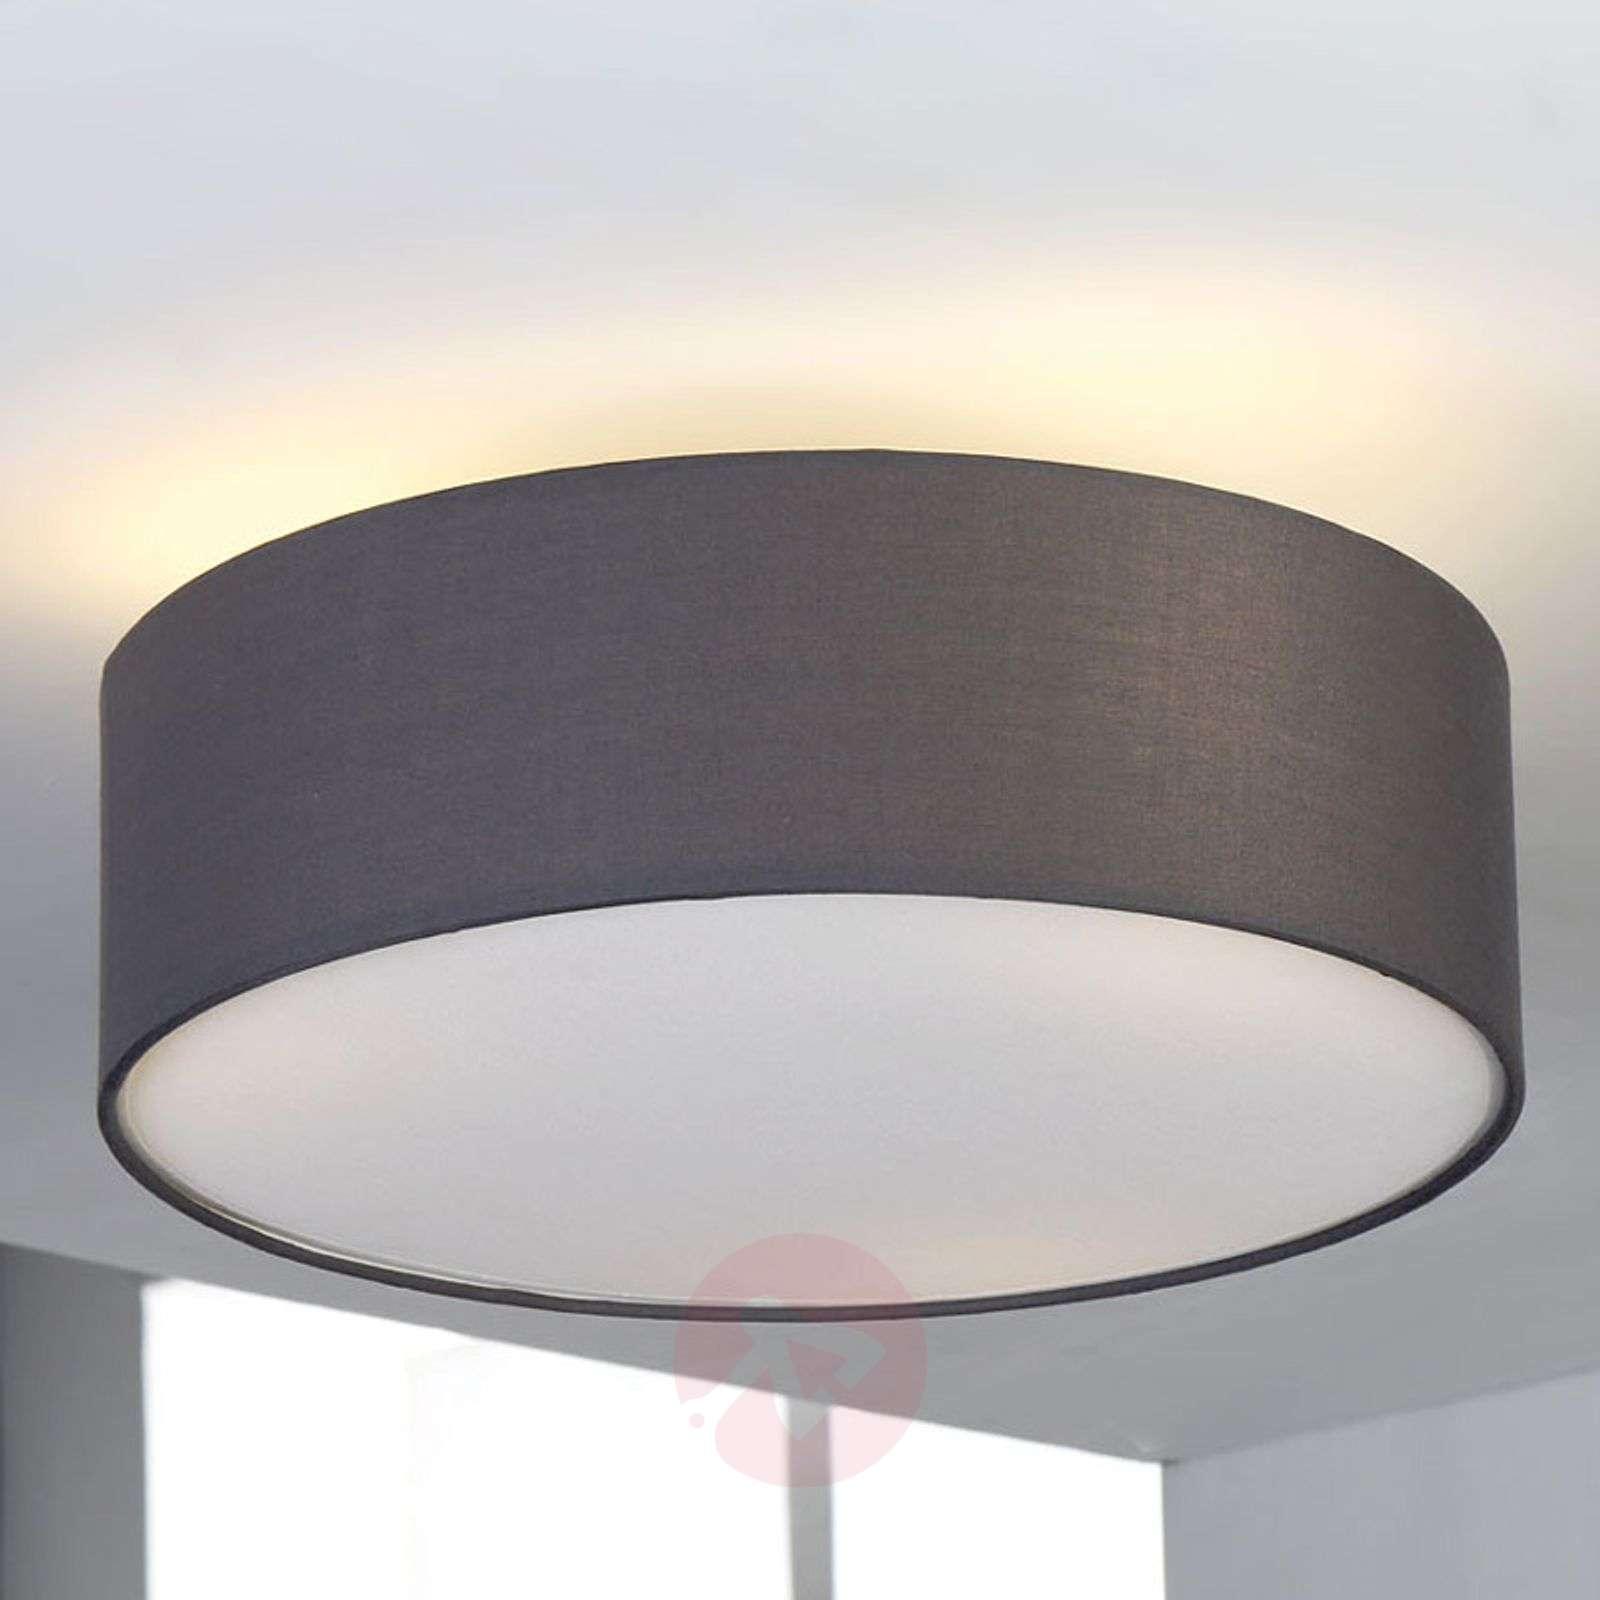 Grey fabric ceiling light Sebatin-9620334-01